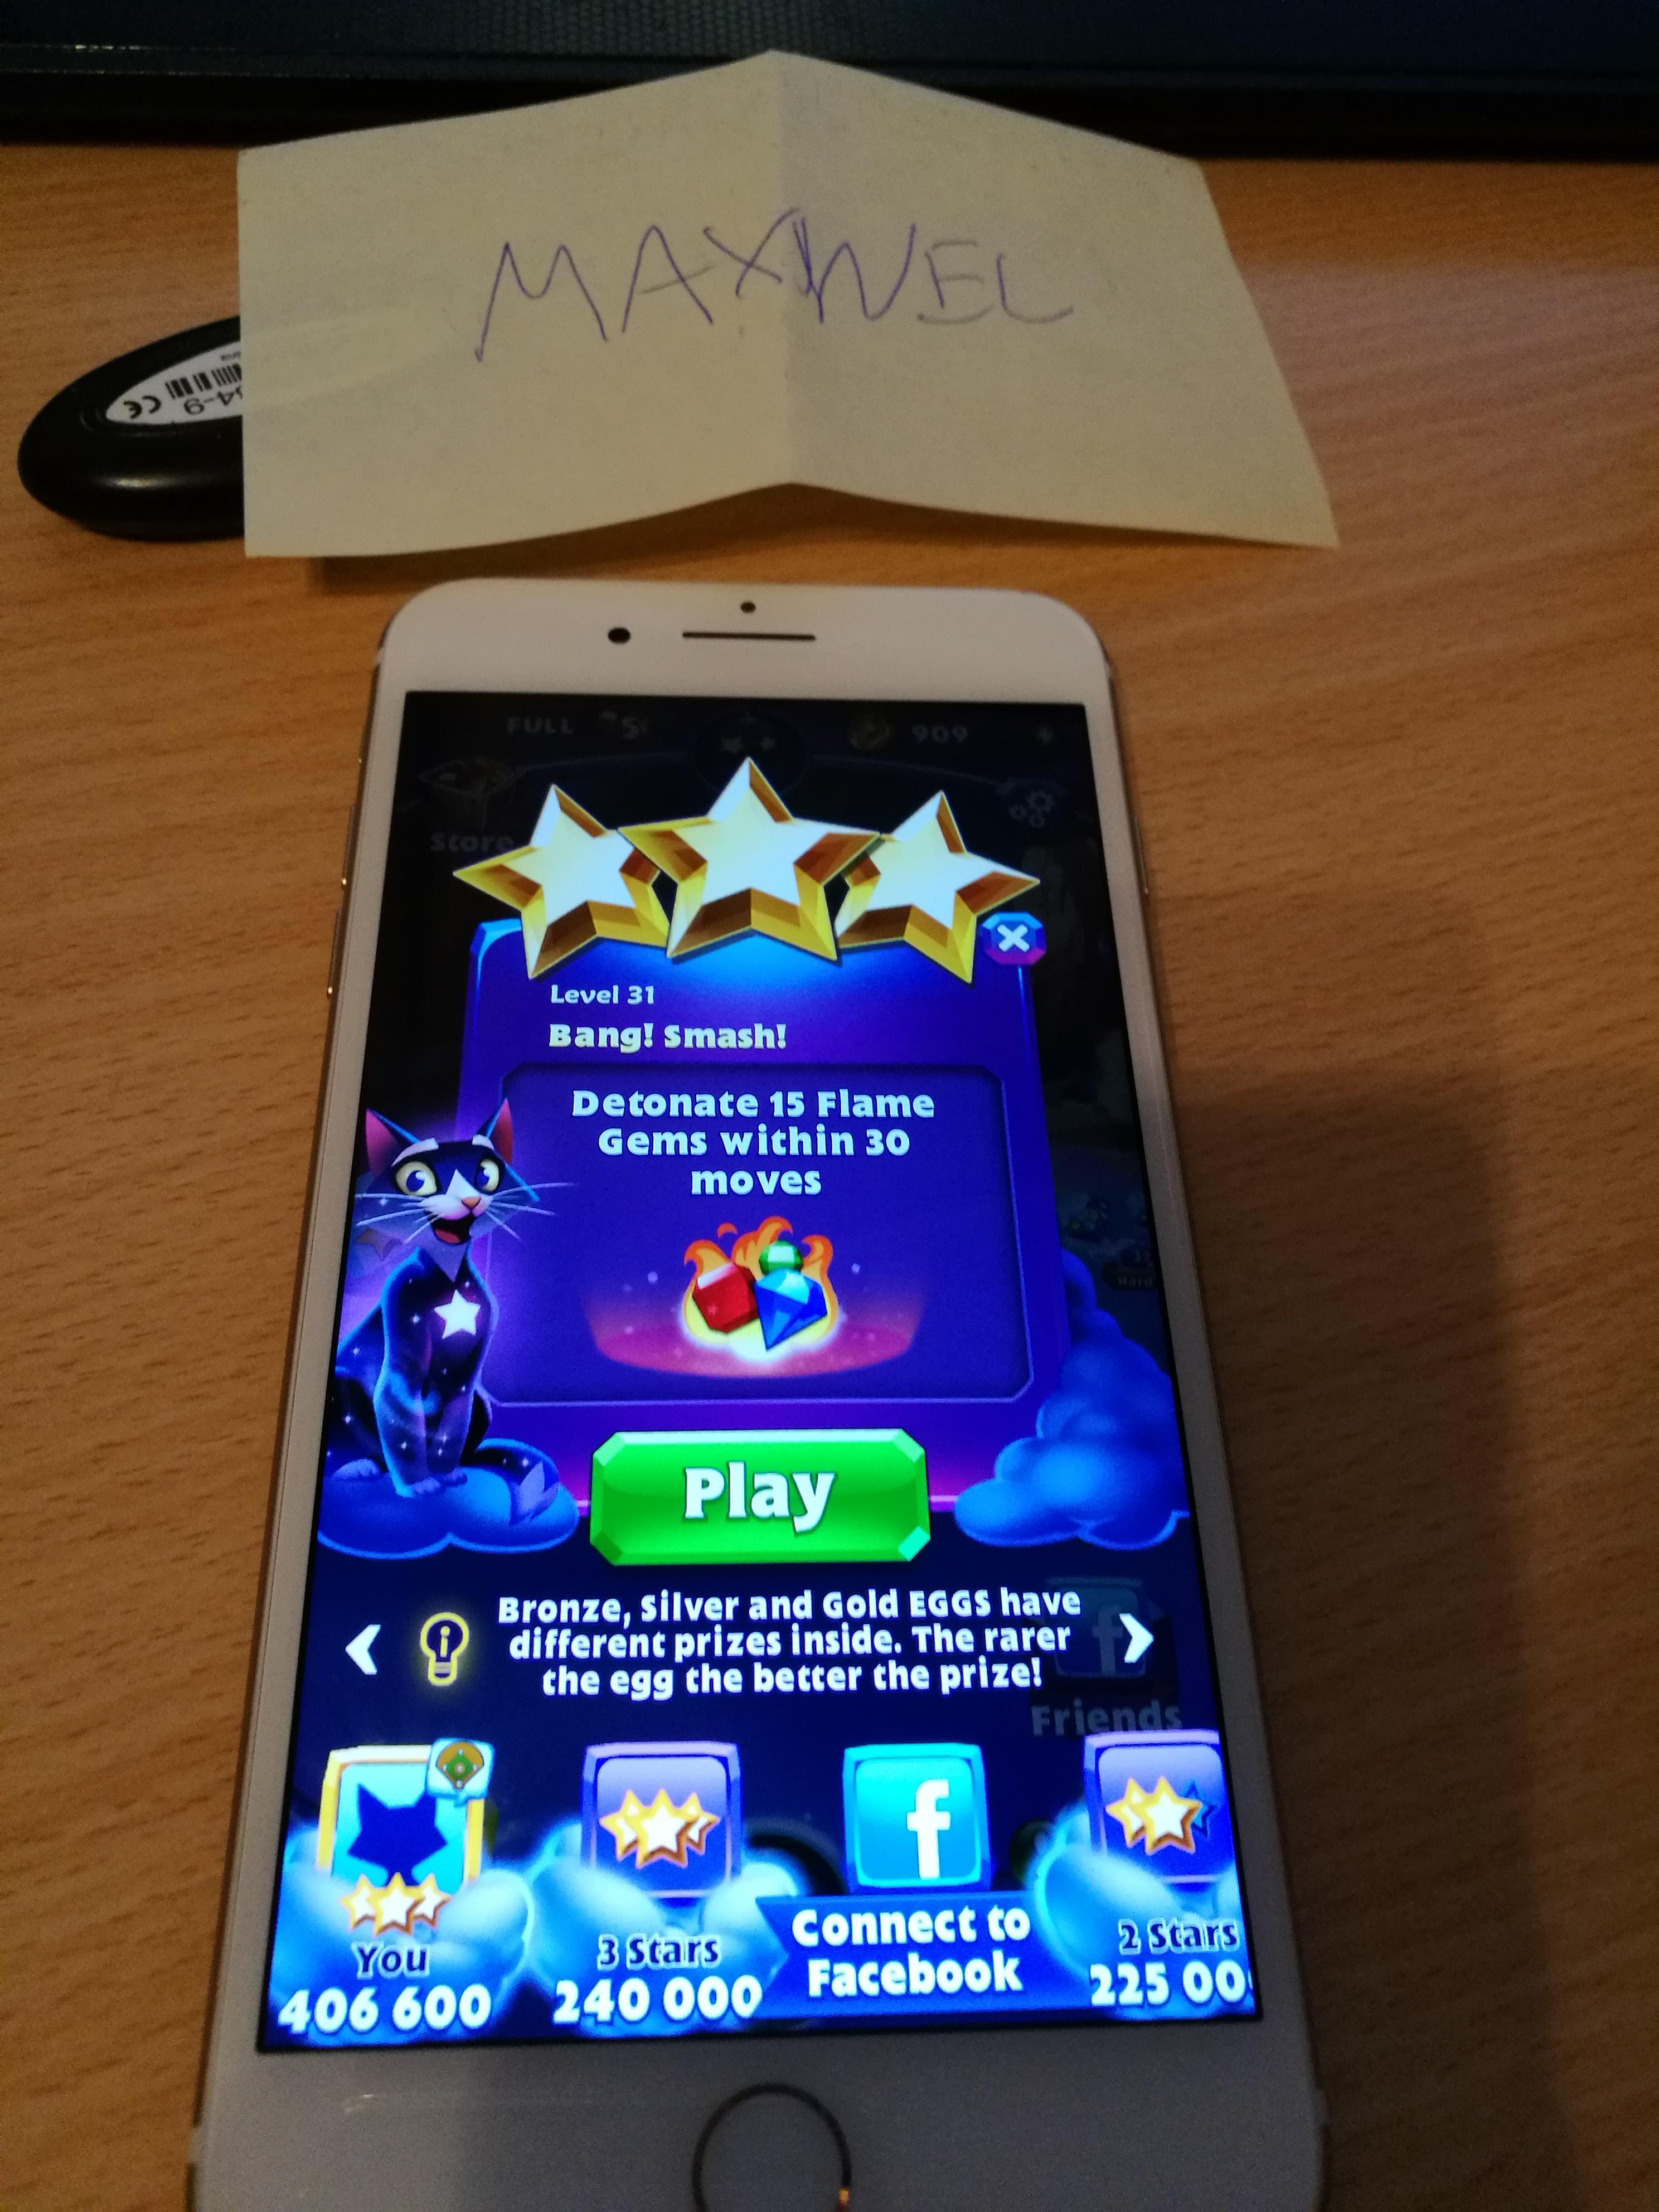 Maxwel: Bejeweled Stars: Level 31: Ban I smash ! (iOS) 406,600 points on 2016-11-13 16:15:38